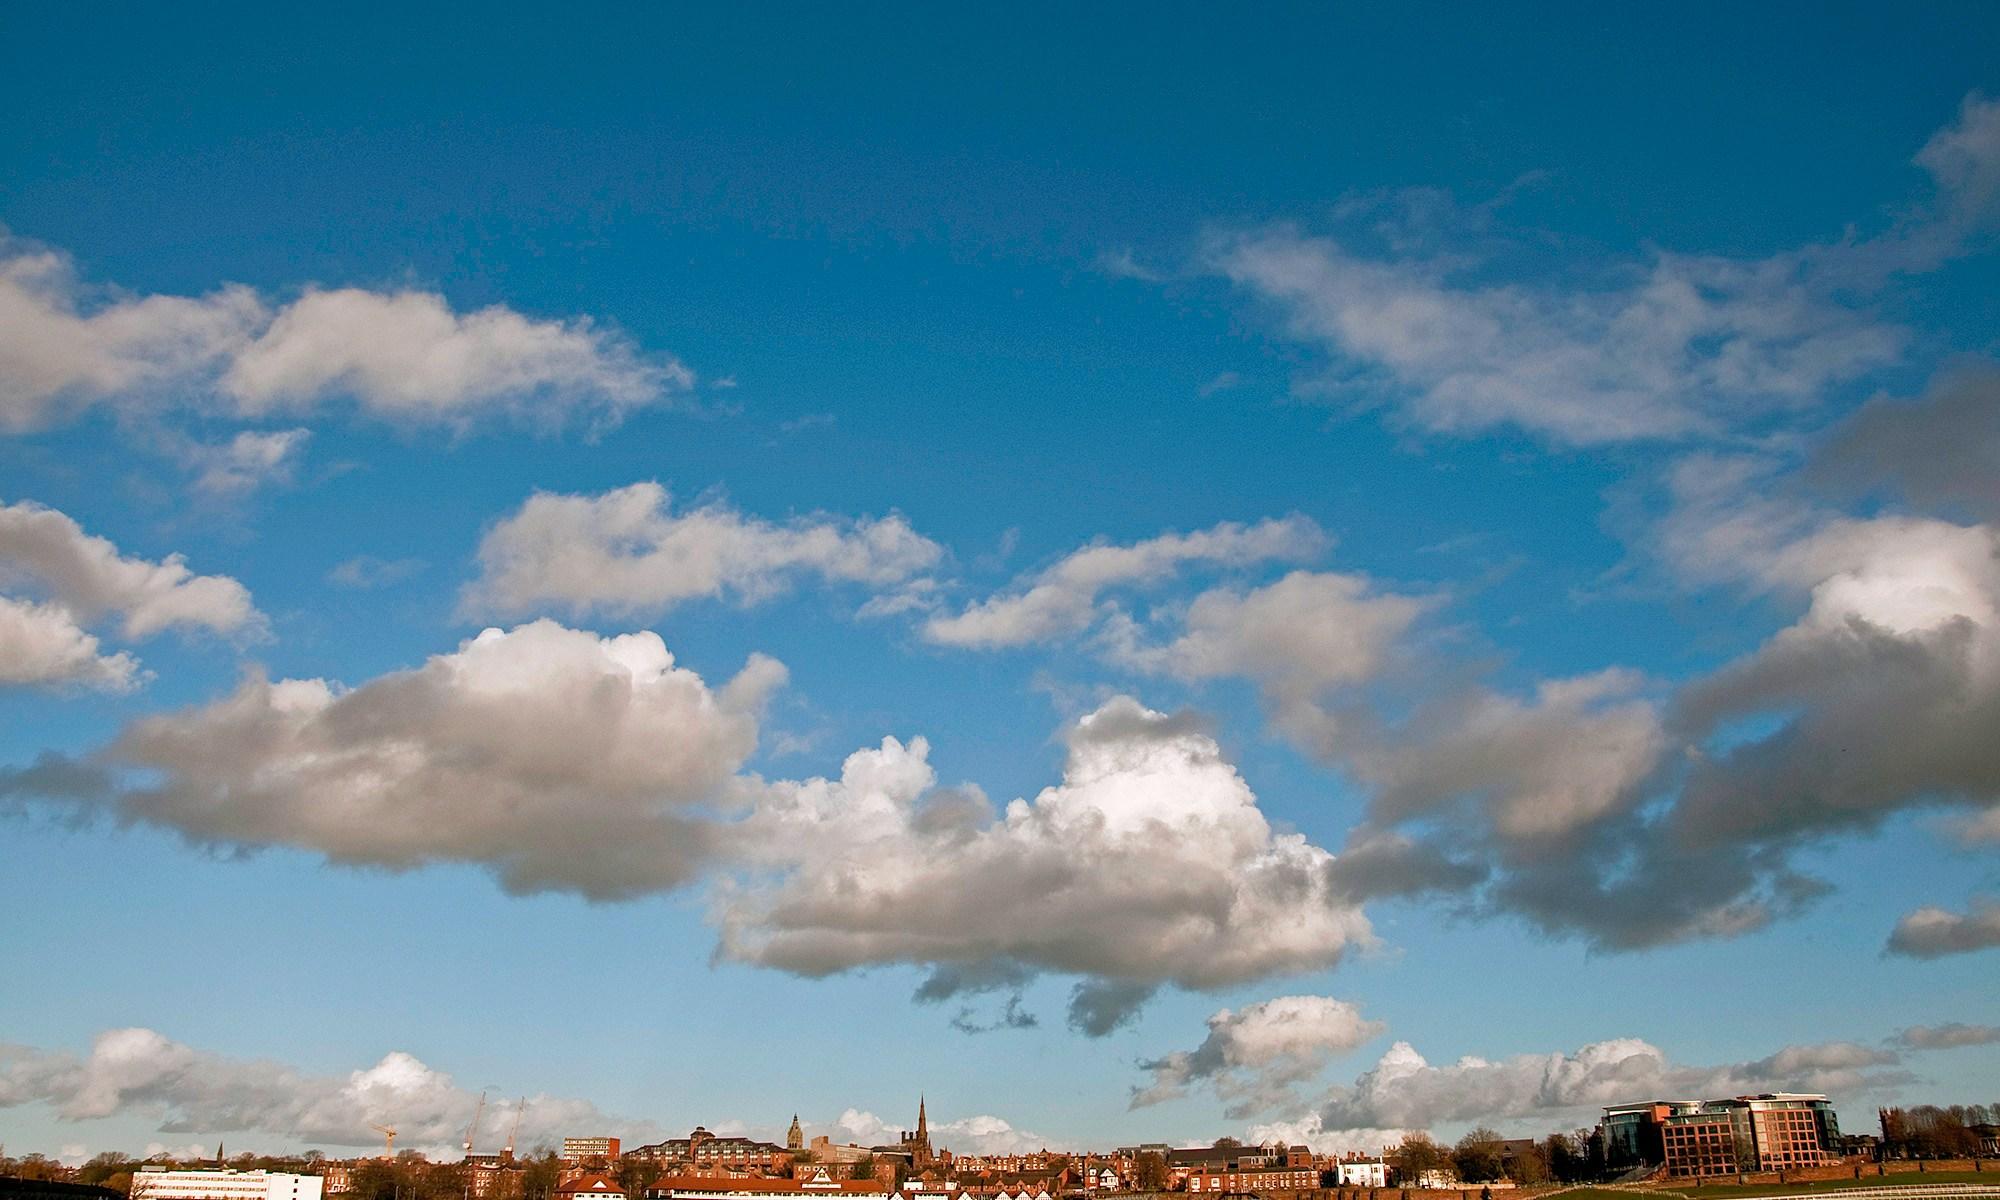 Skyscape over Chester Racecourse